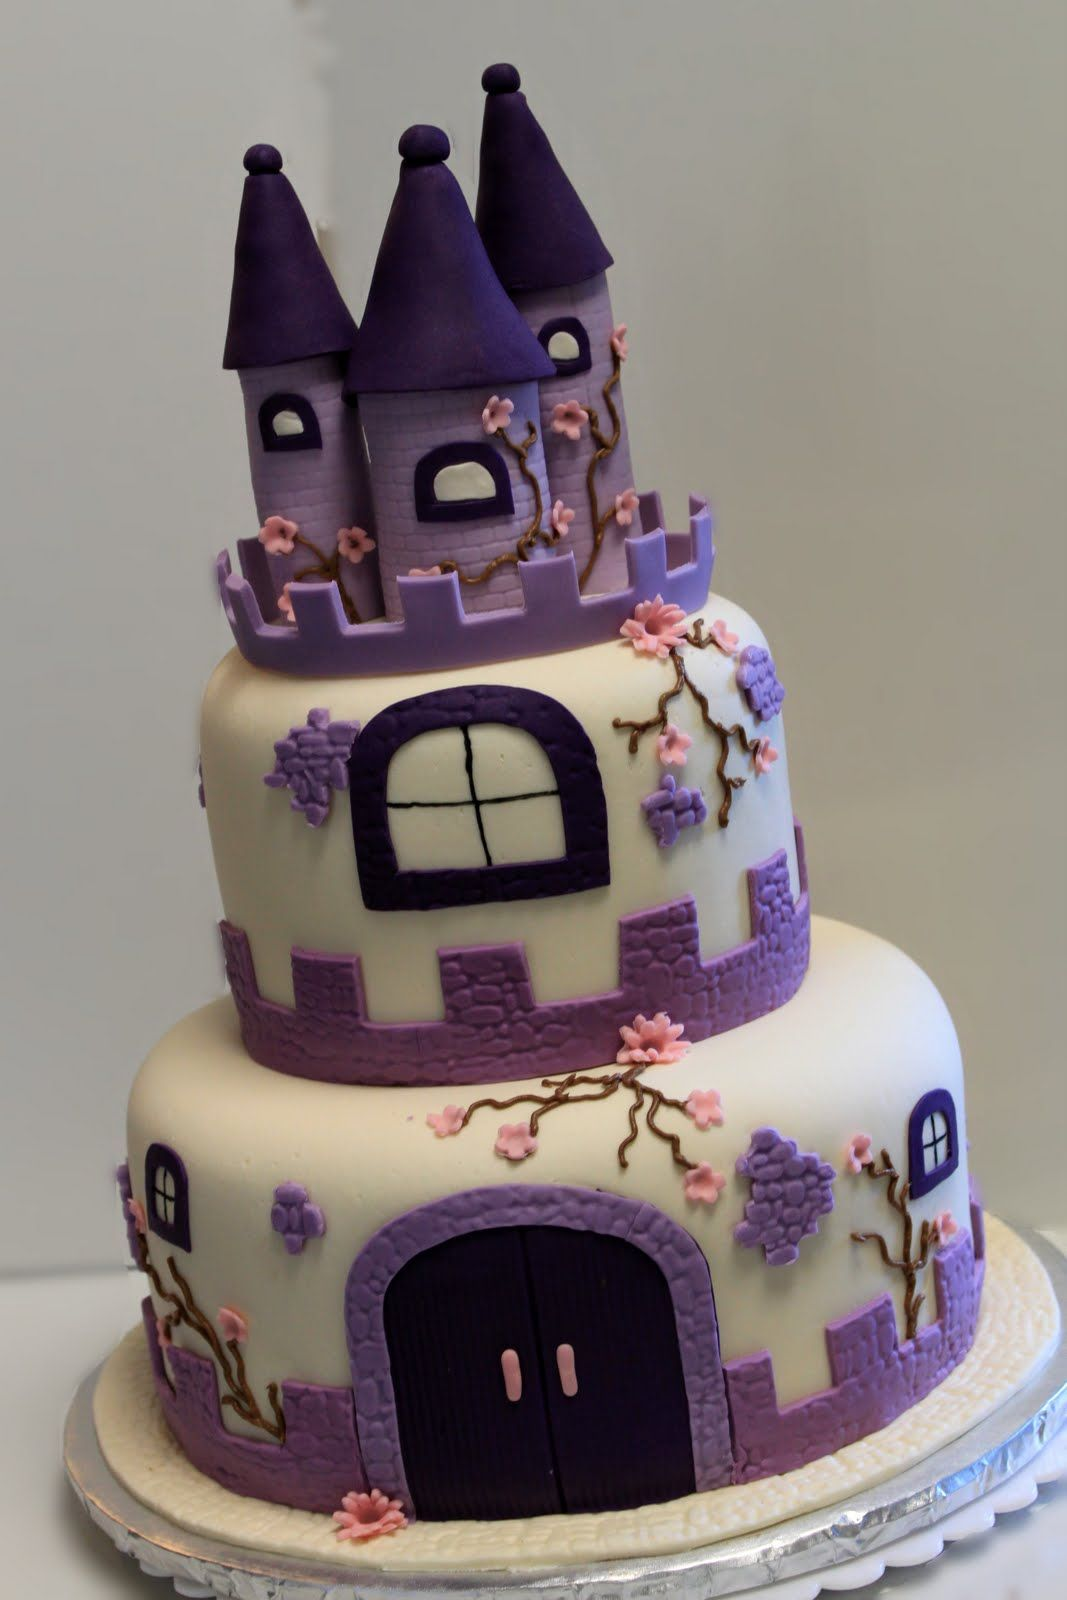 dinosaur castle birthday cakeasli | cakes & cake decorating